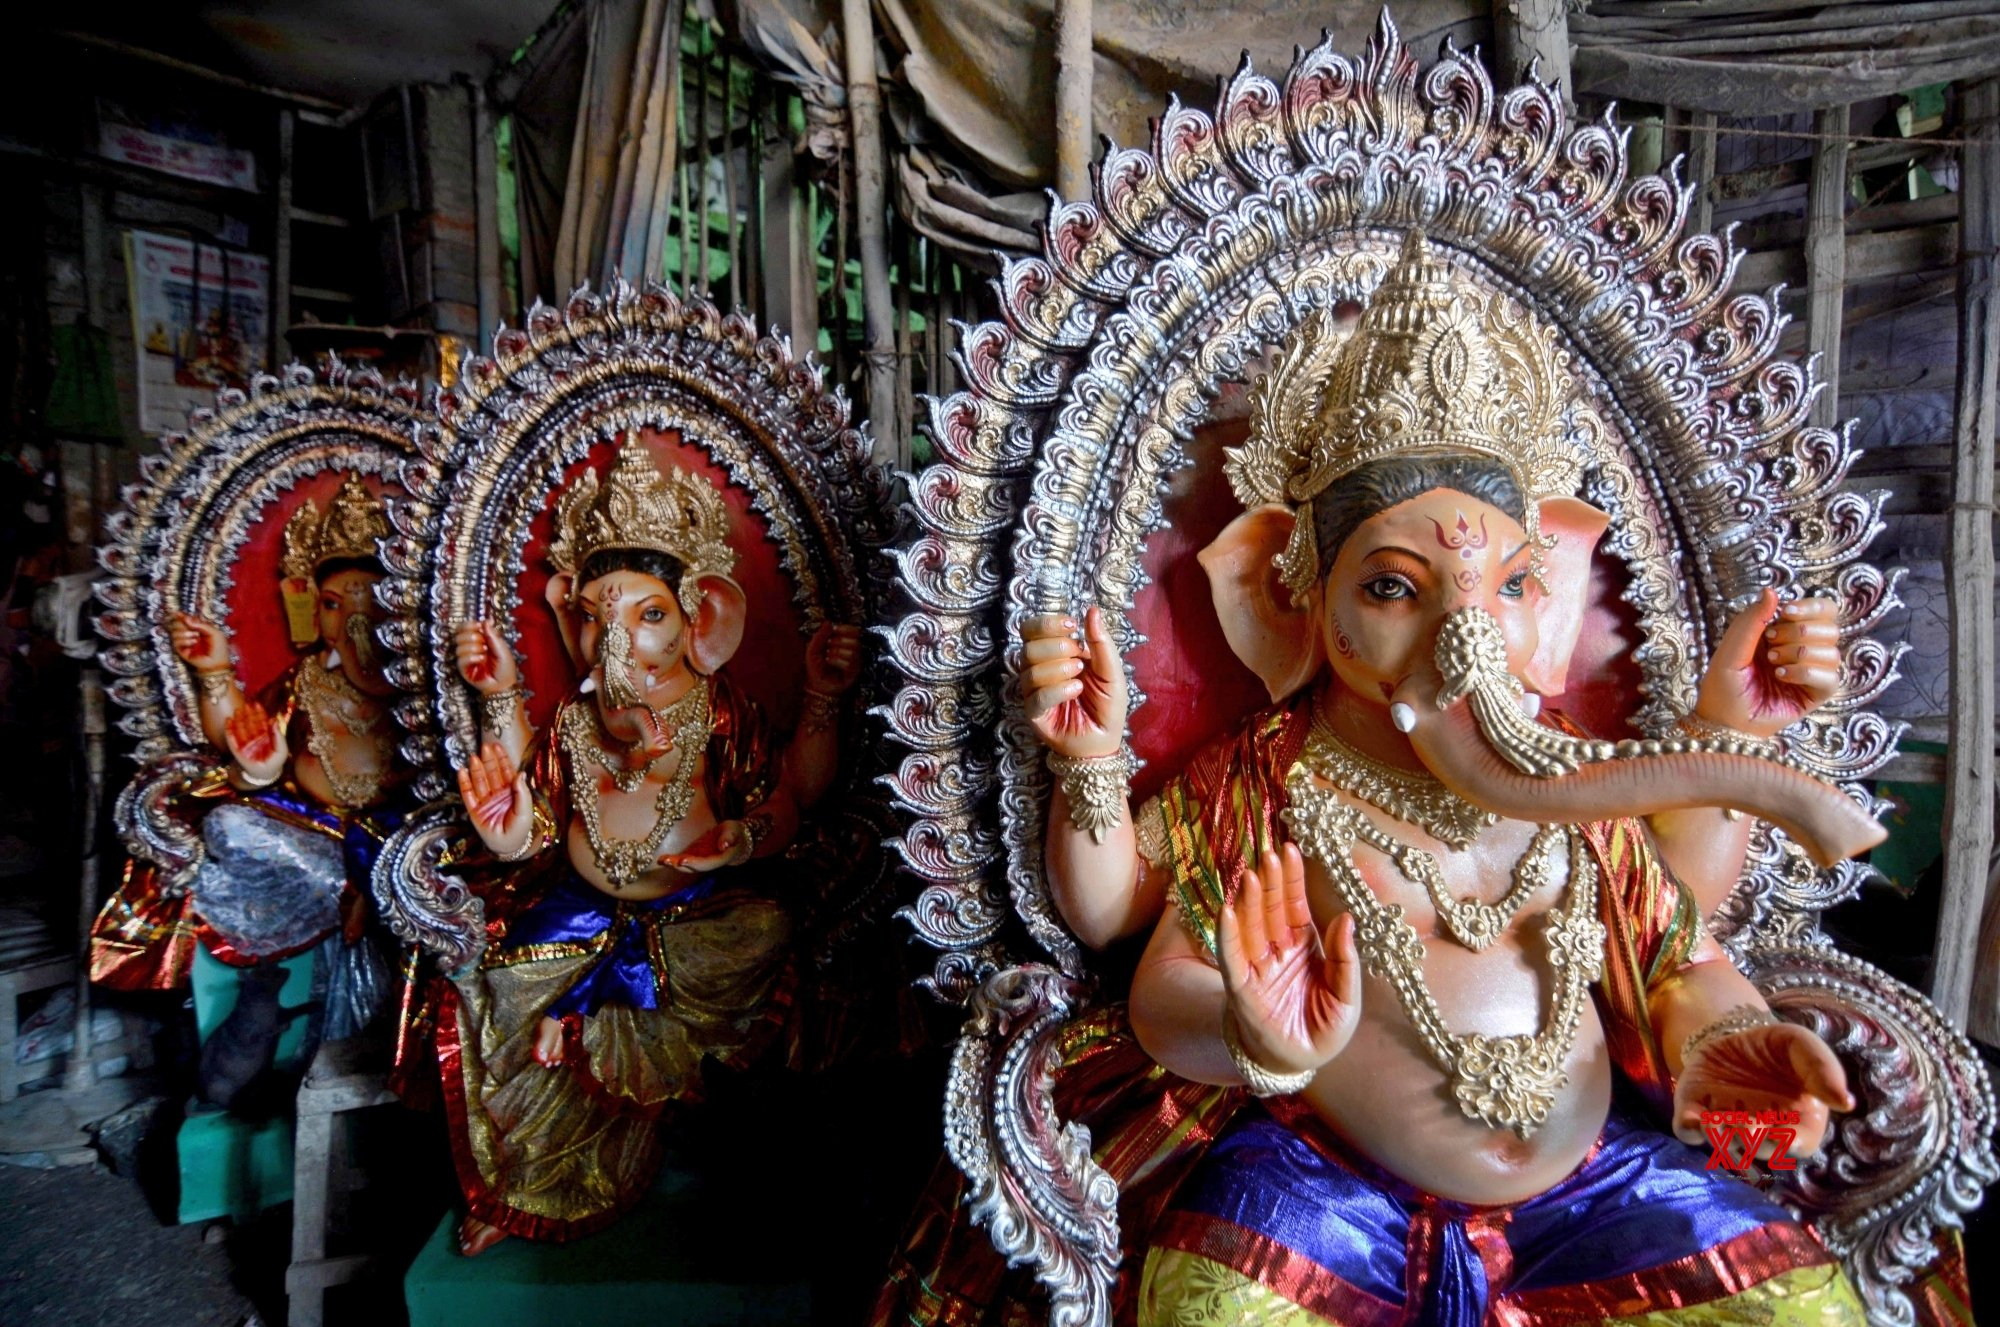 KVIC to begin online booking of Lakshmi-Ganesh idols